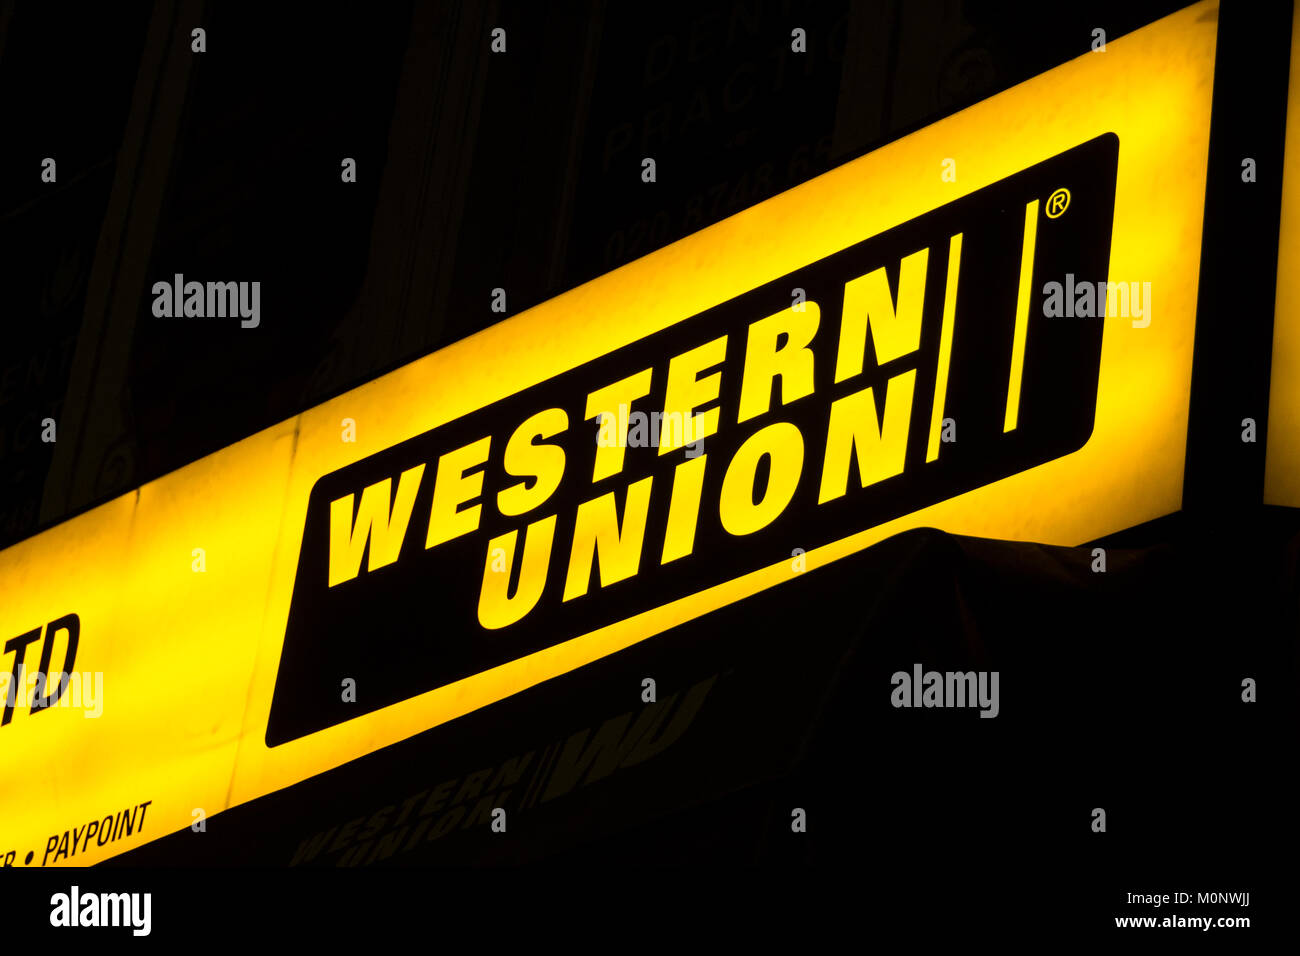 Western union money transfer stockfotos western union money